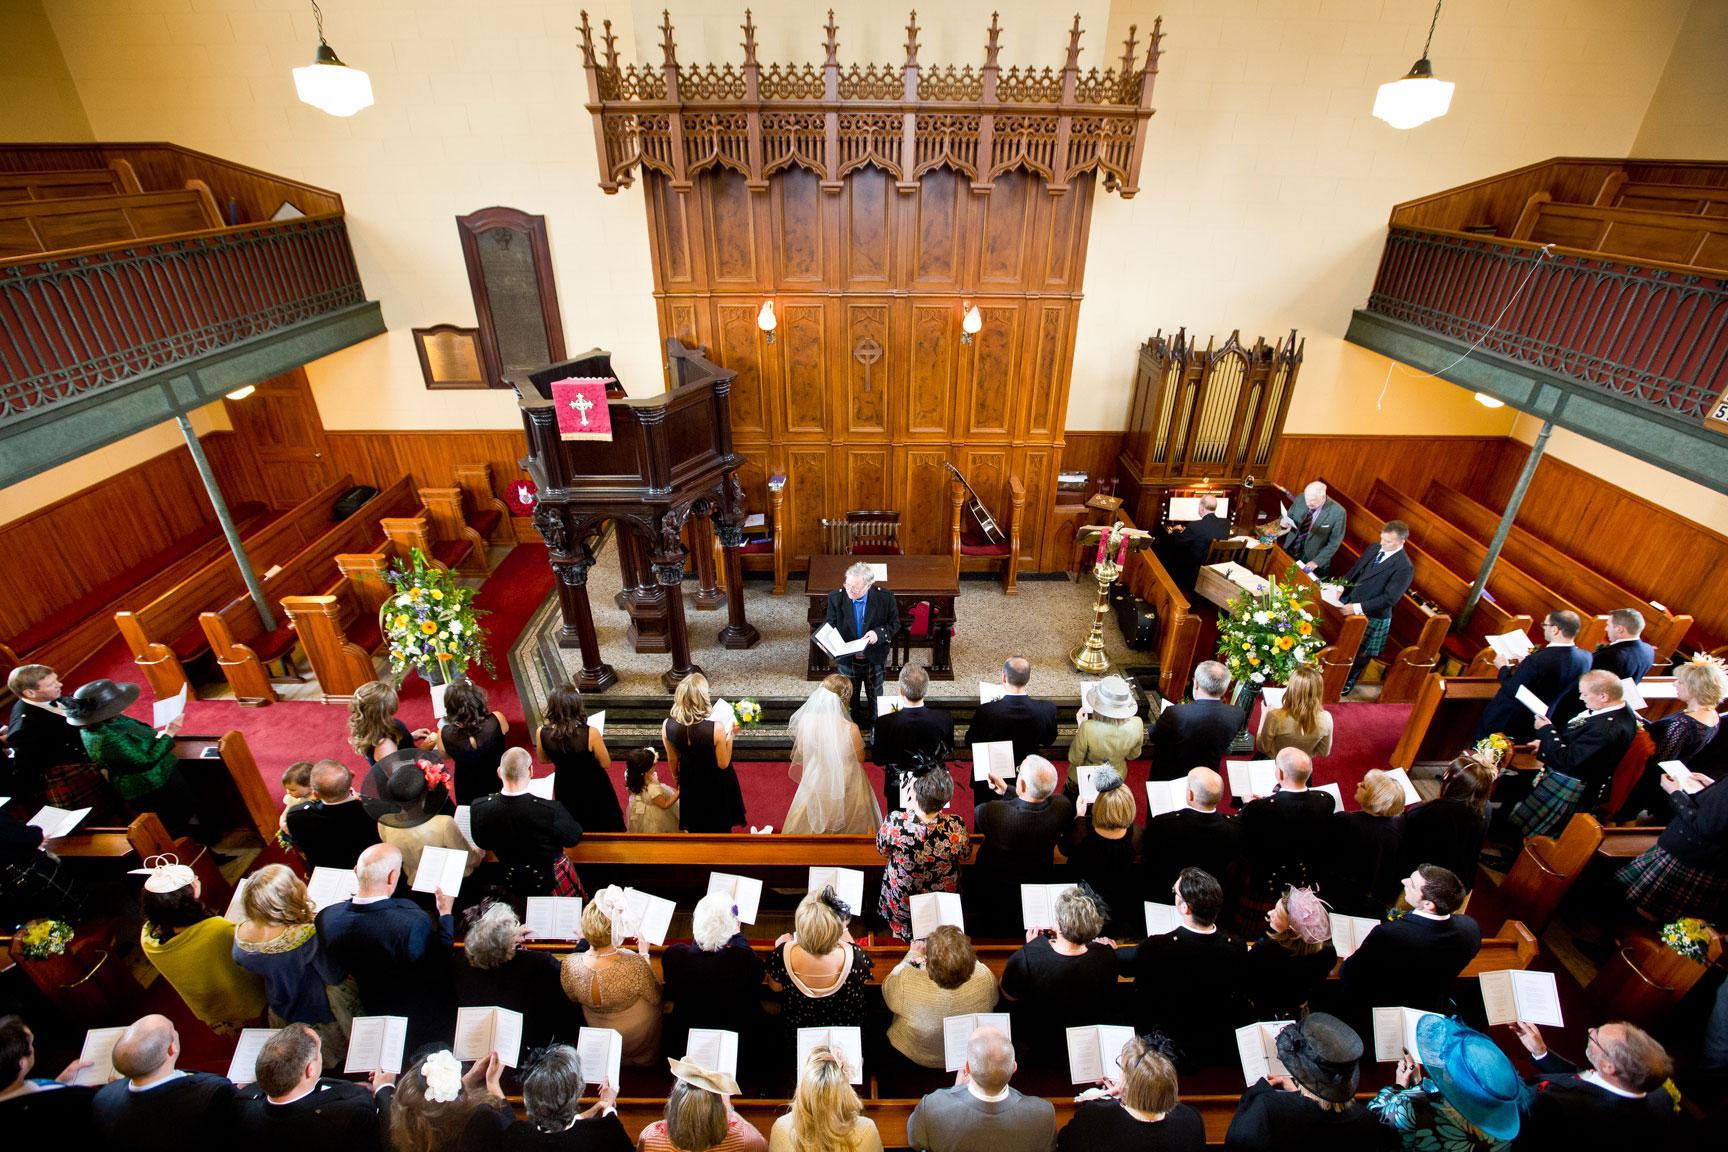 inveraray-church-of-scotland-wedding